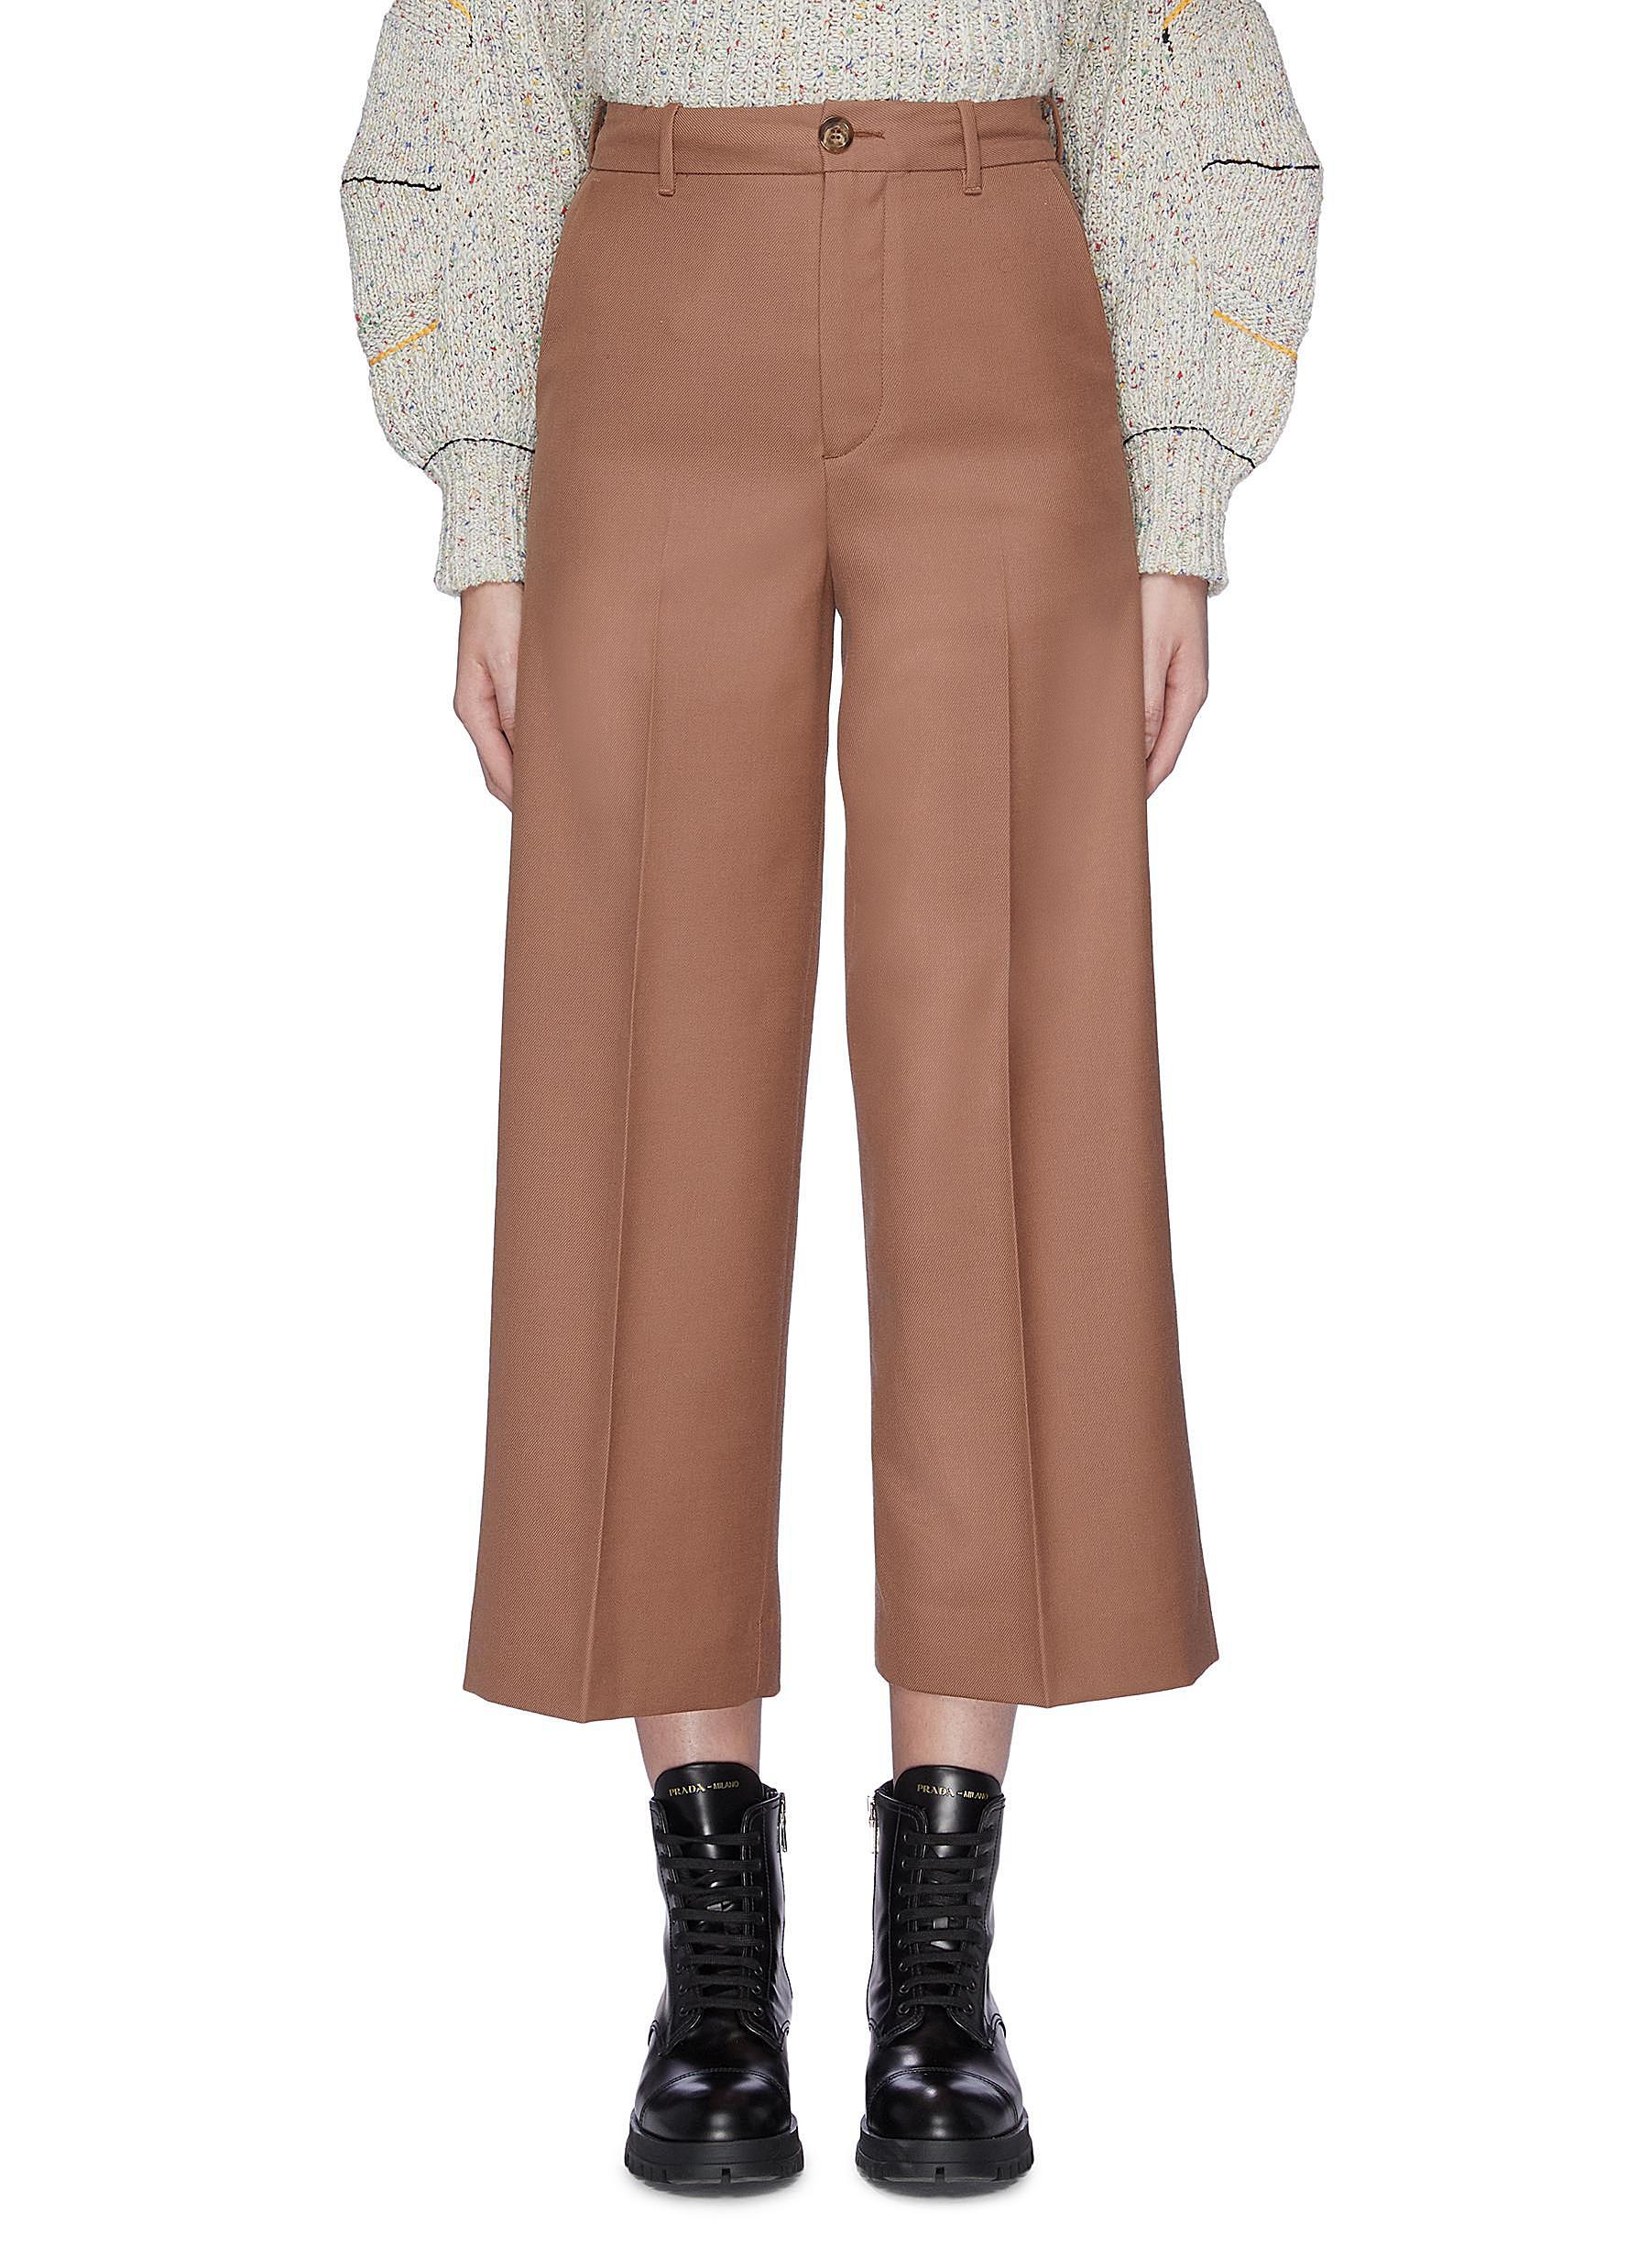 Buy Moncler Pants & Shorts Cropped Virgin wool chinos